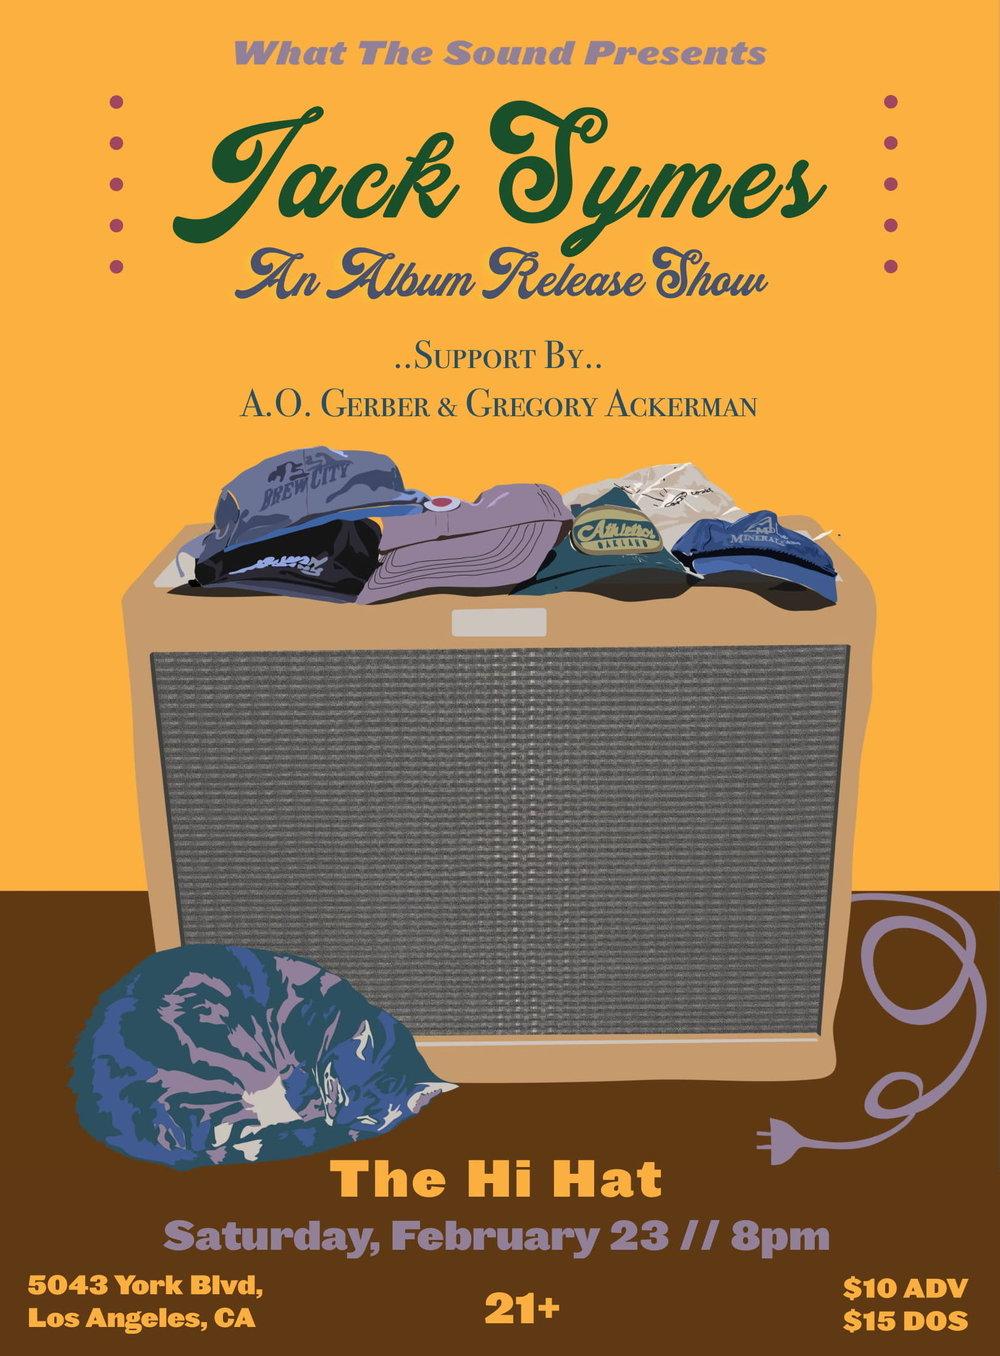 JACK SYMES / A.O. GERBER / GREGORY ACKERMAN - Artwork by Jake ShapiroFebruary 23, 2019 @ The Hi Hat$10 ADV / $15 DOS21+